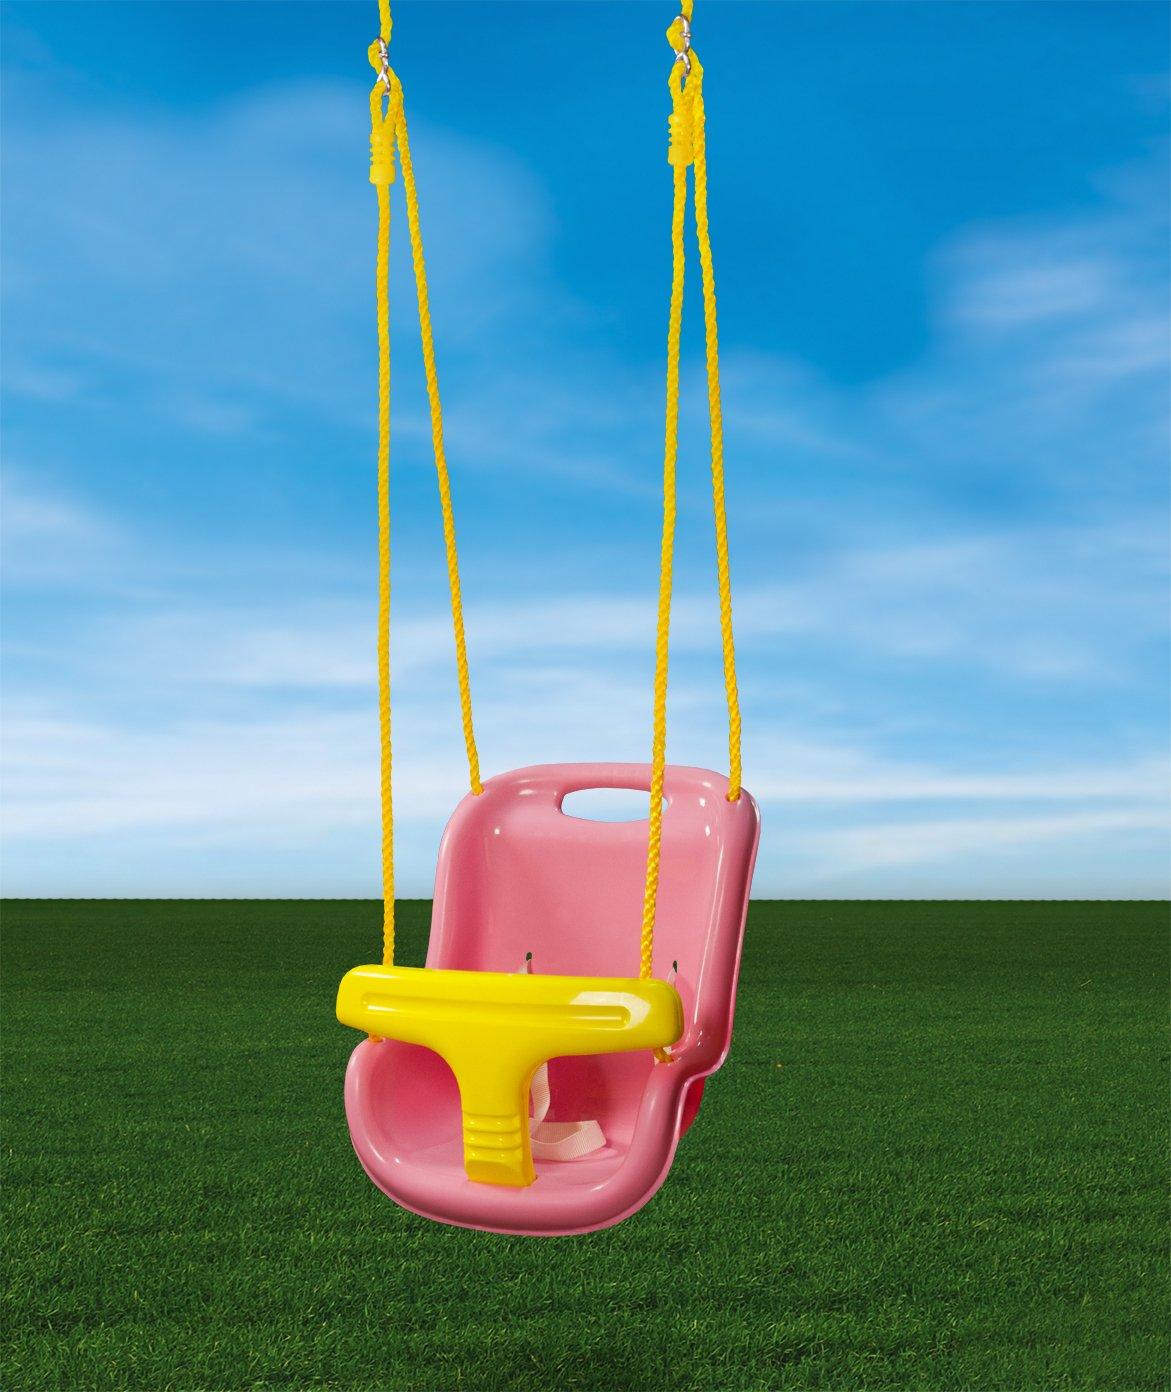 Gorillaplaysets Infant Swing - Pink Gorilla Playsets 04-0032-PK